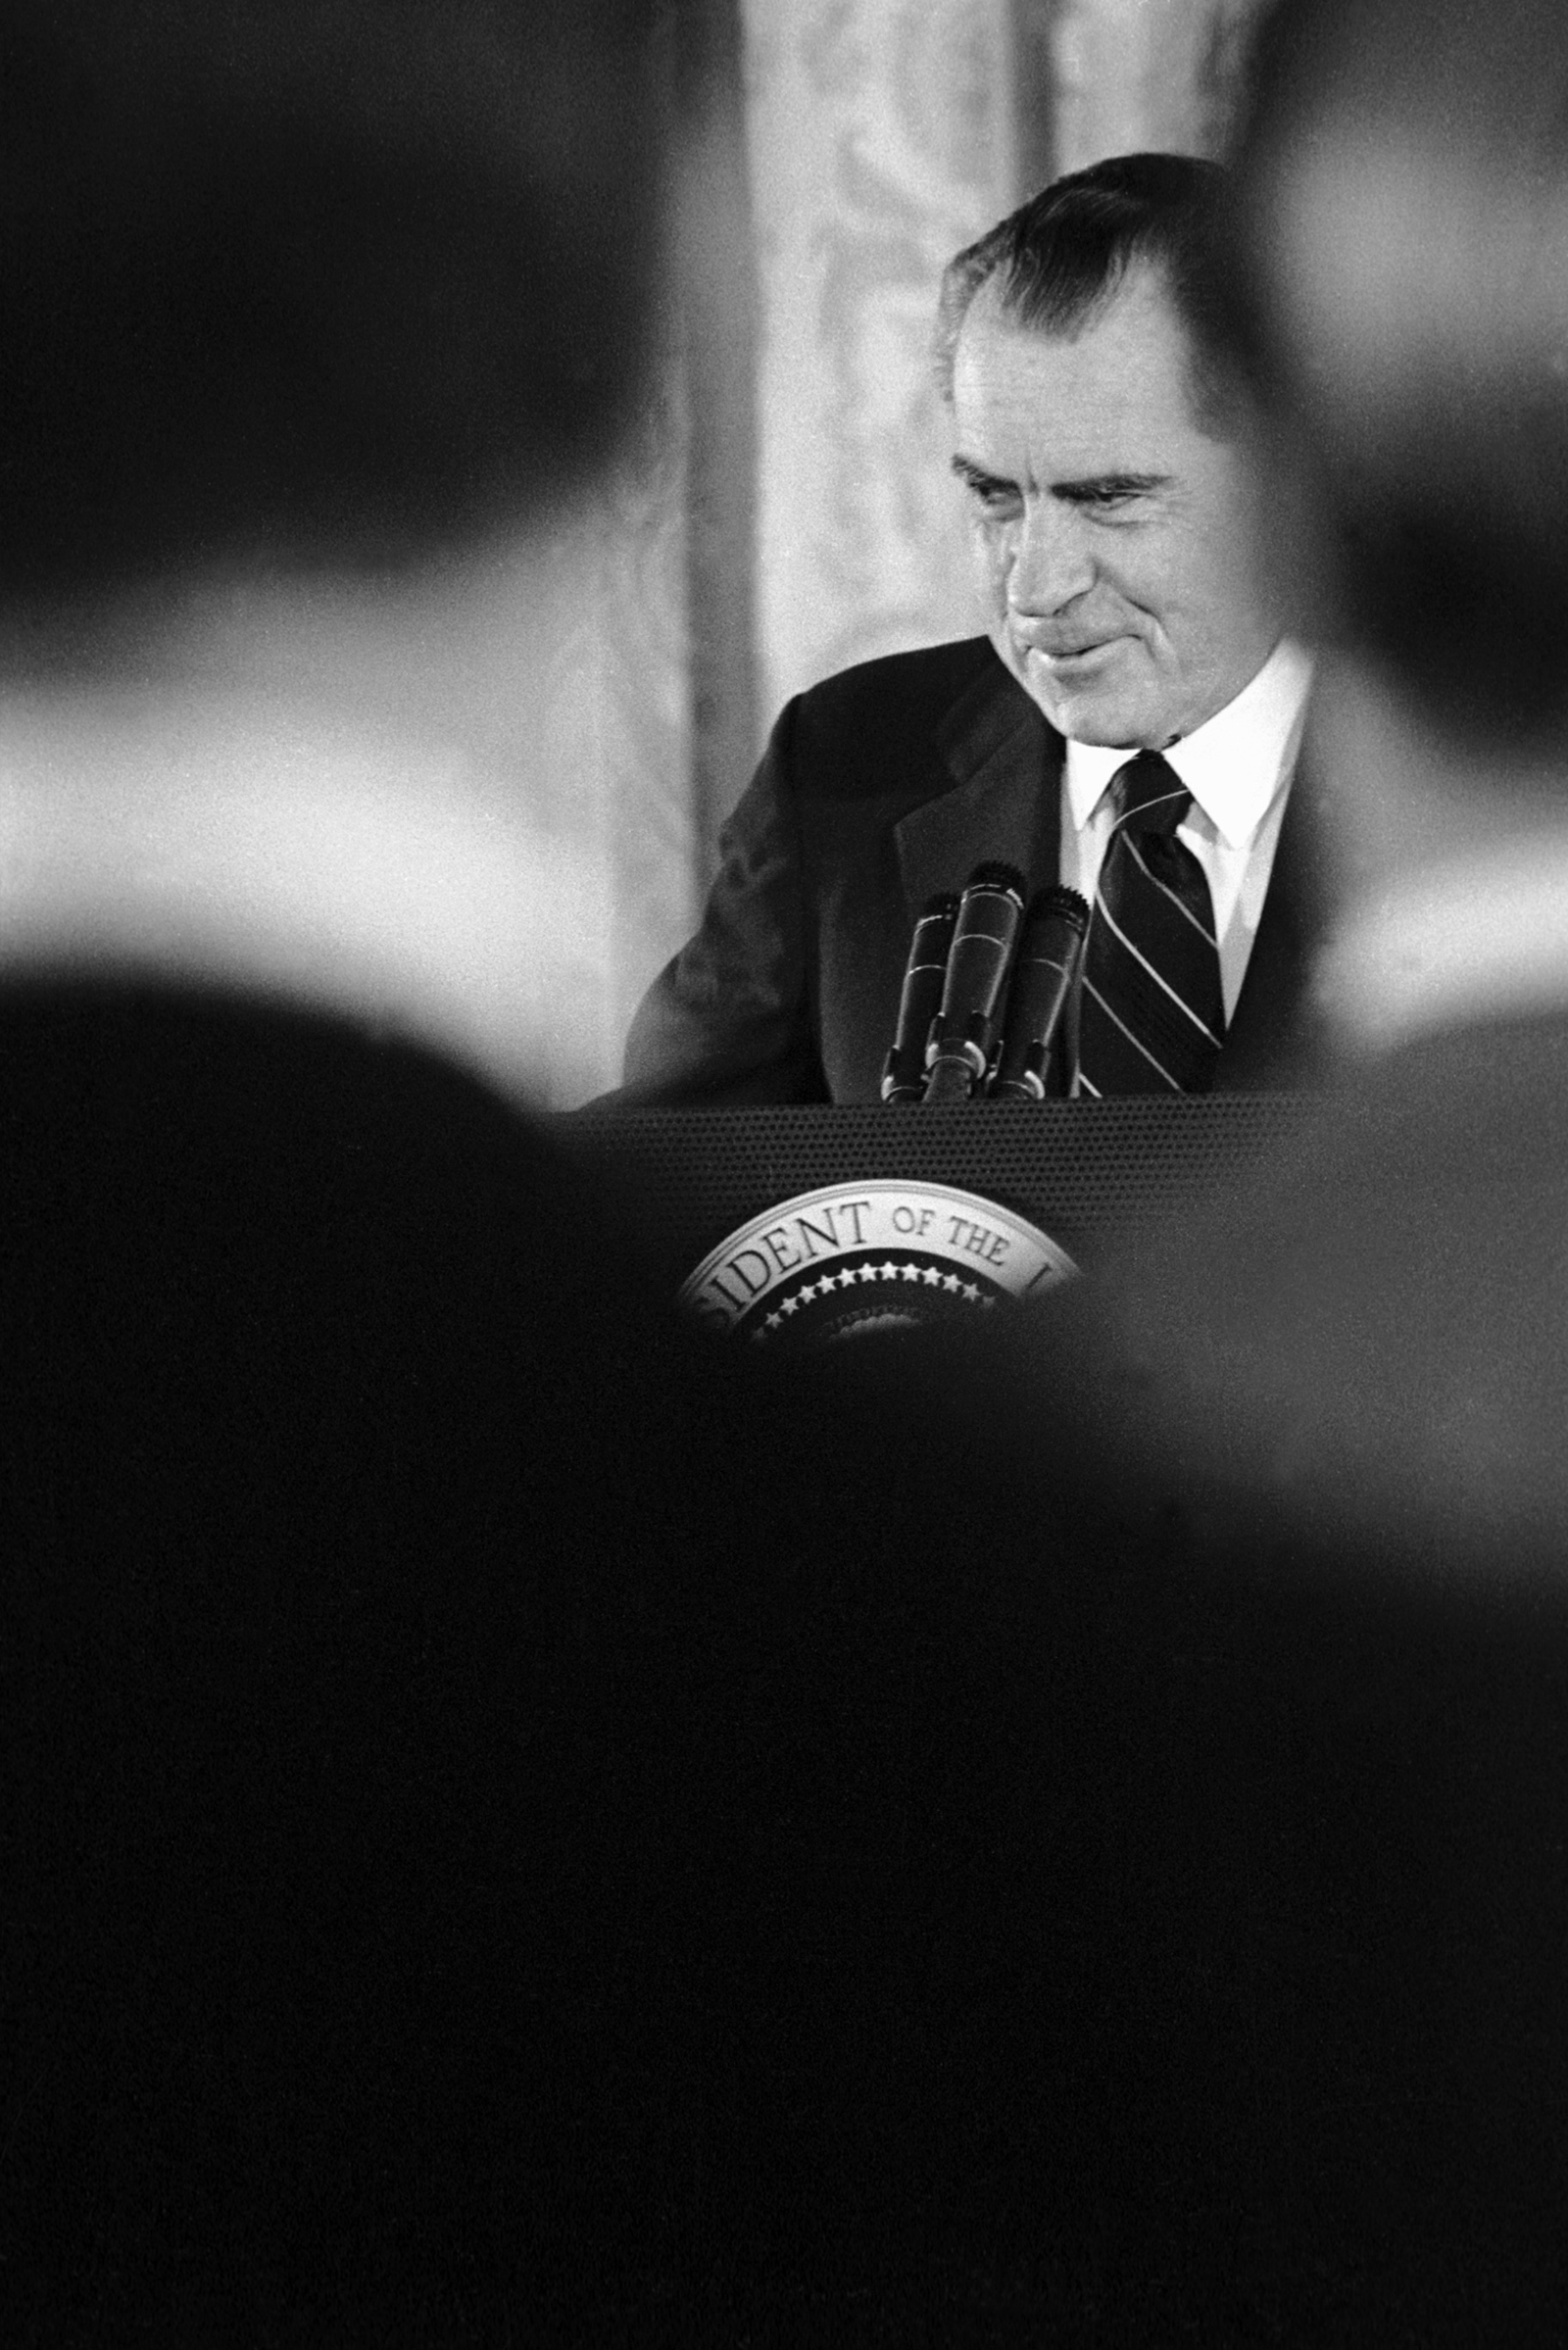 Richard Nixon at a press conference at the White House, October 1973